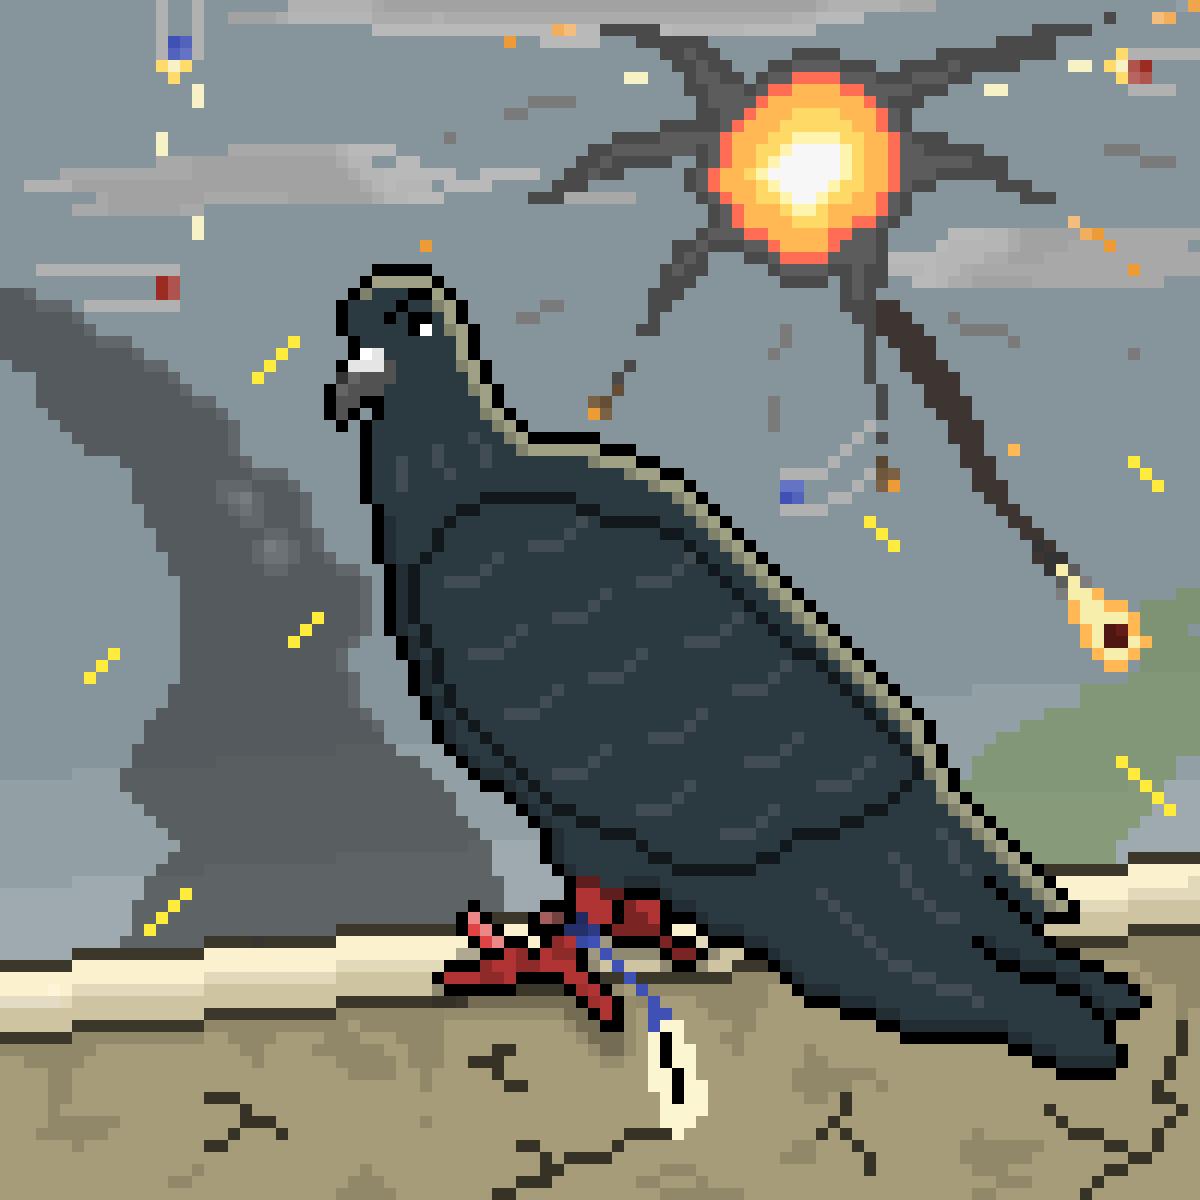 Homing Pigeon AKA Messenger Pigeon by PixelFarts